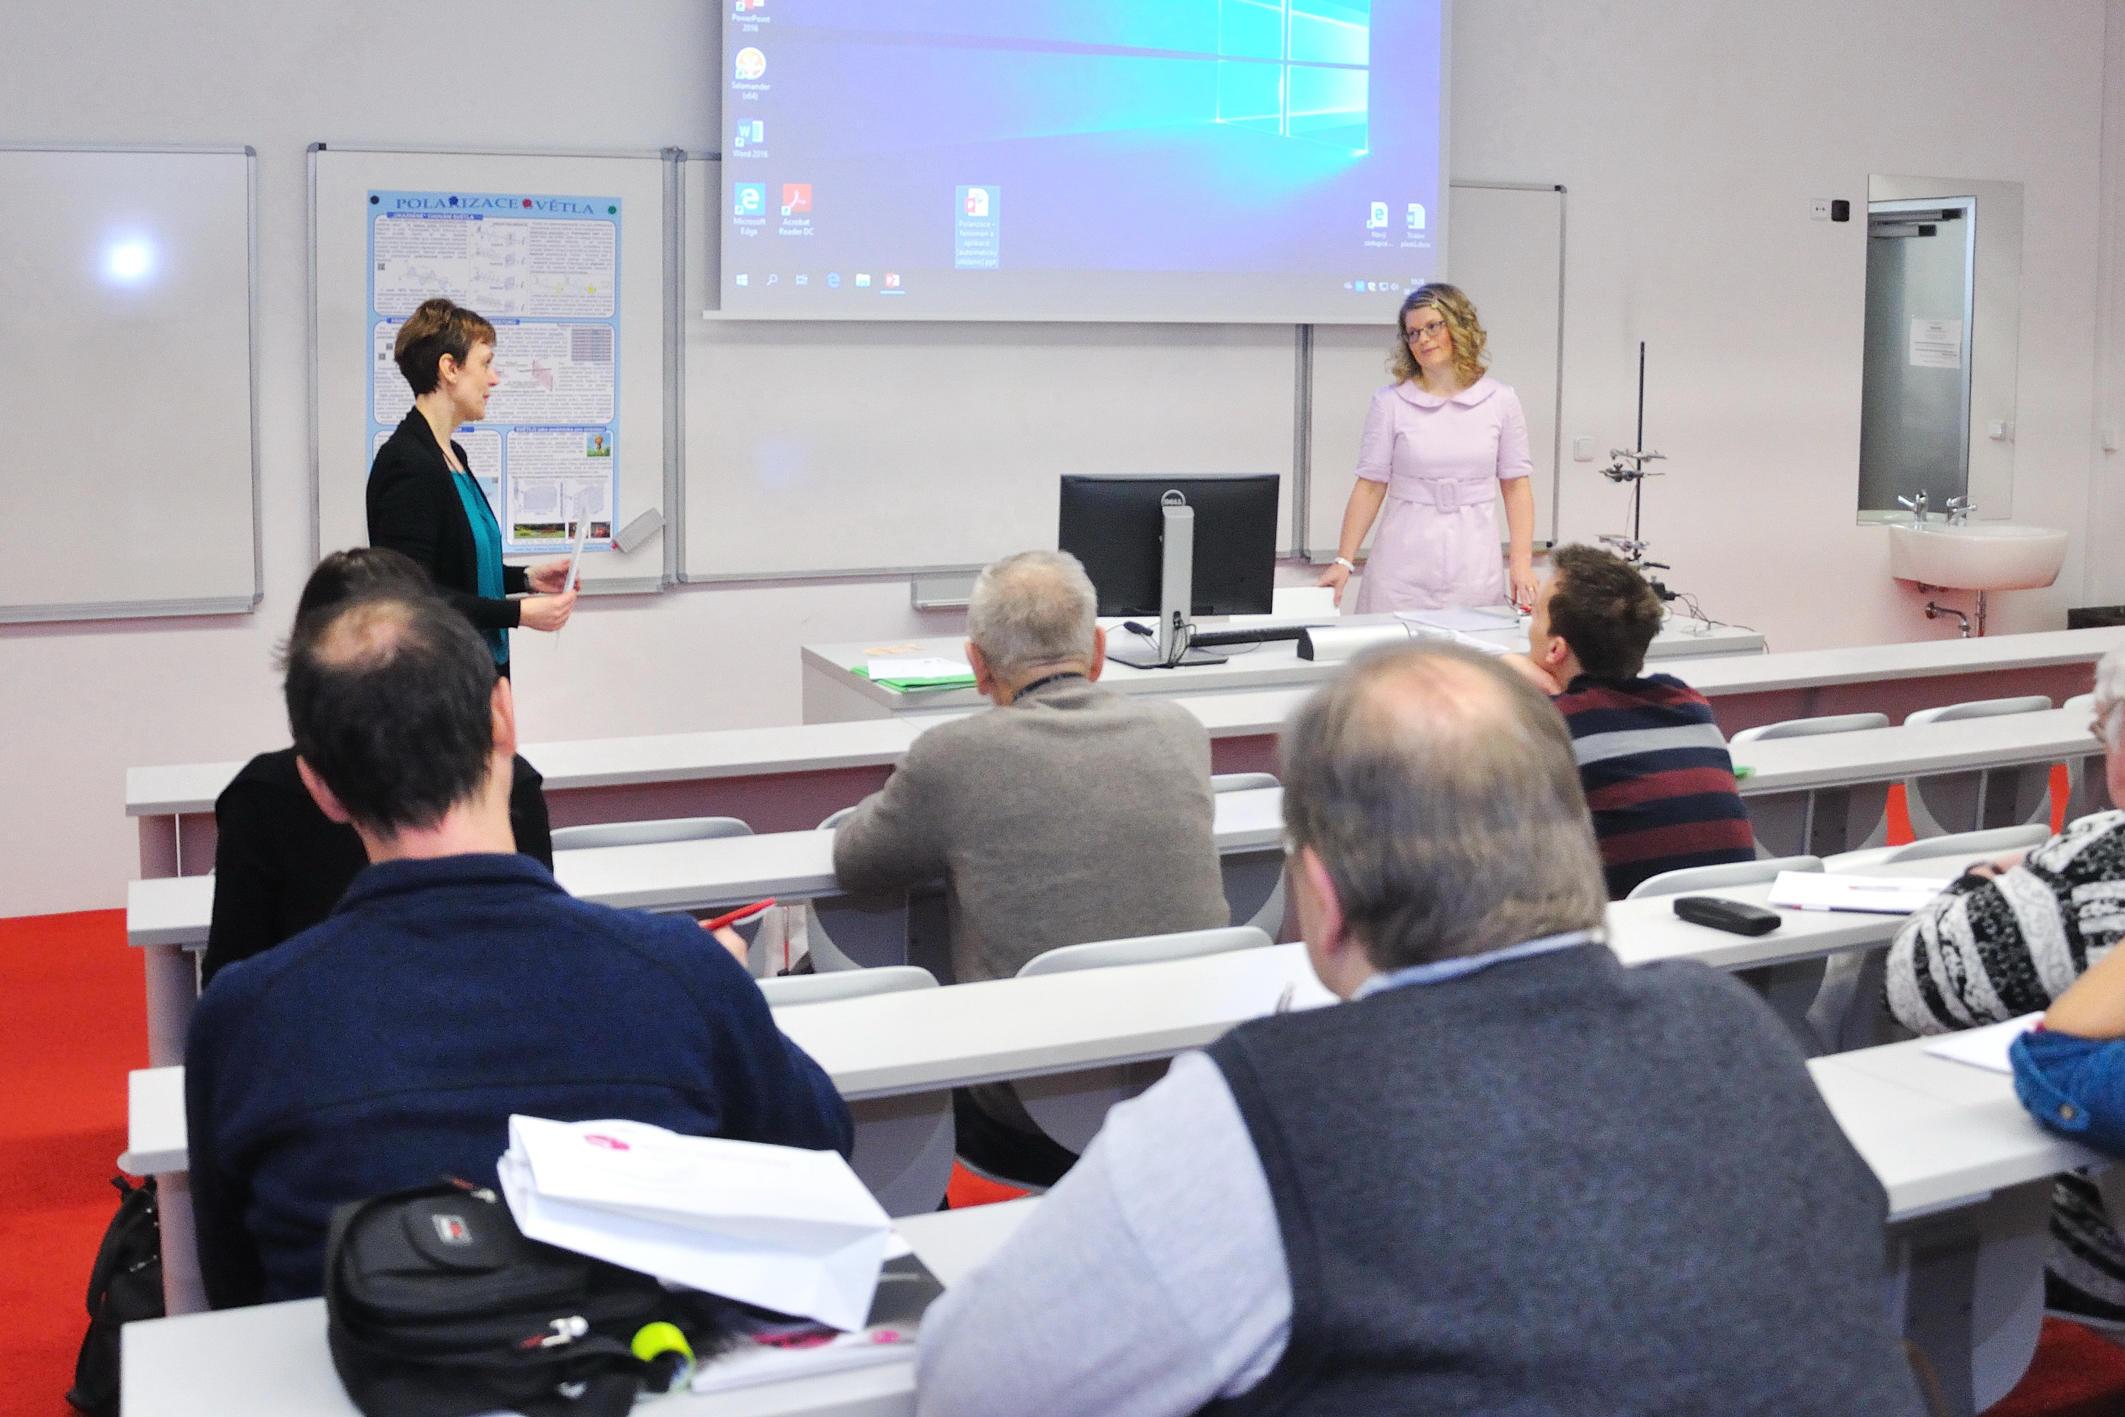 2. semináře pro učitele chemie